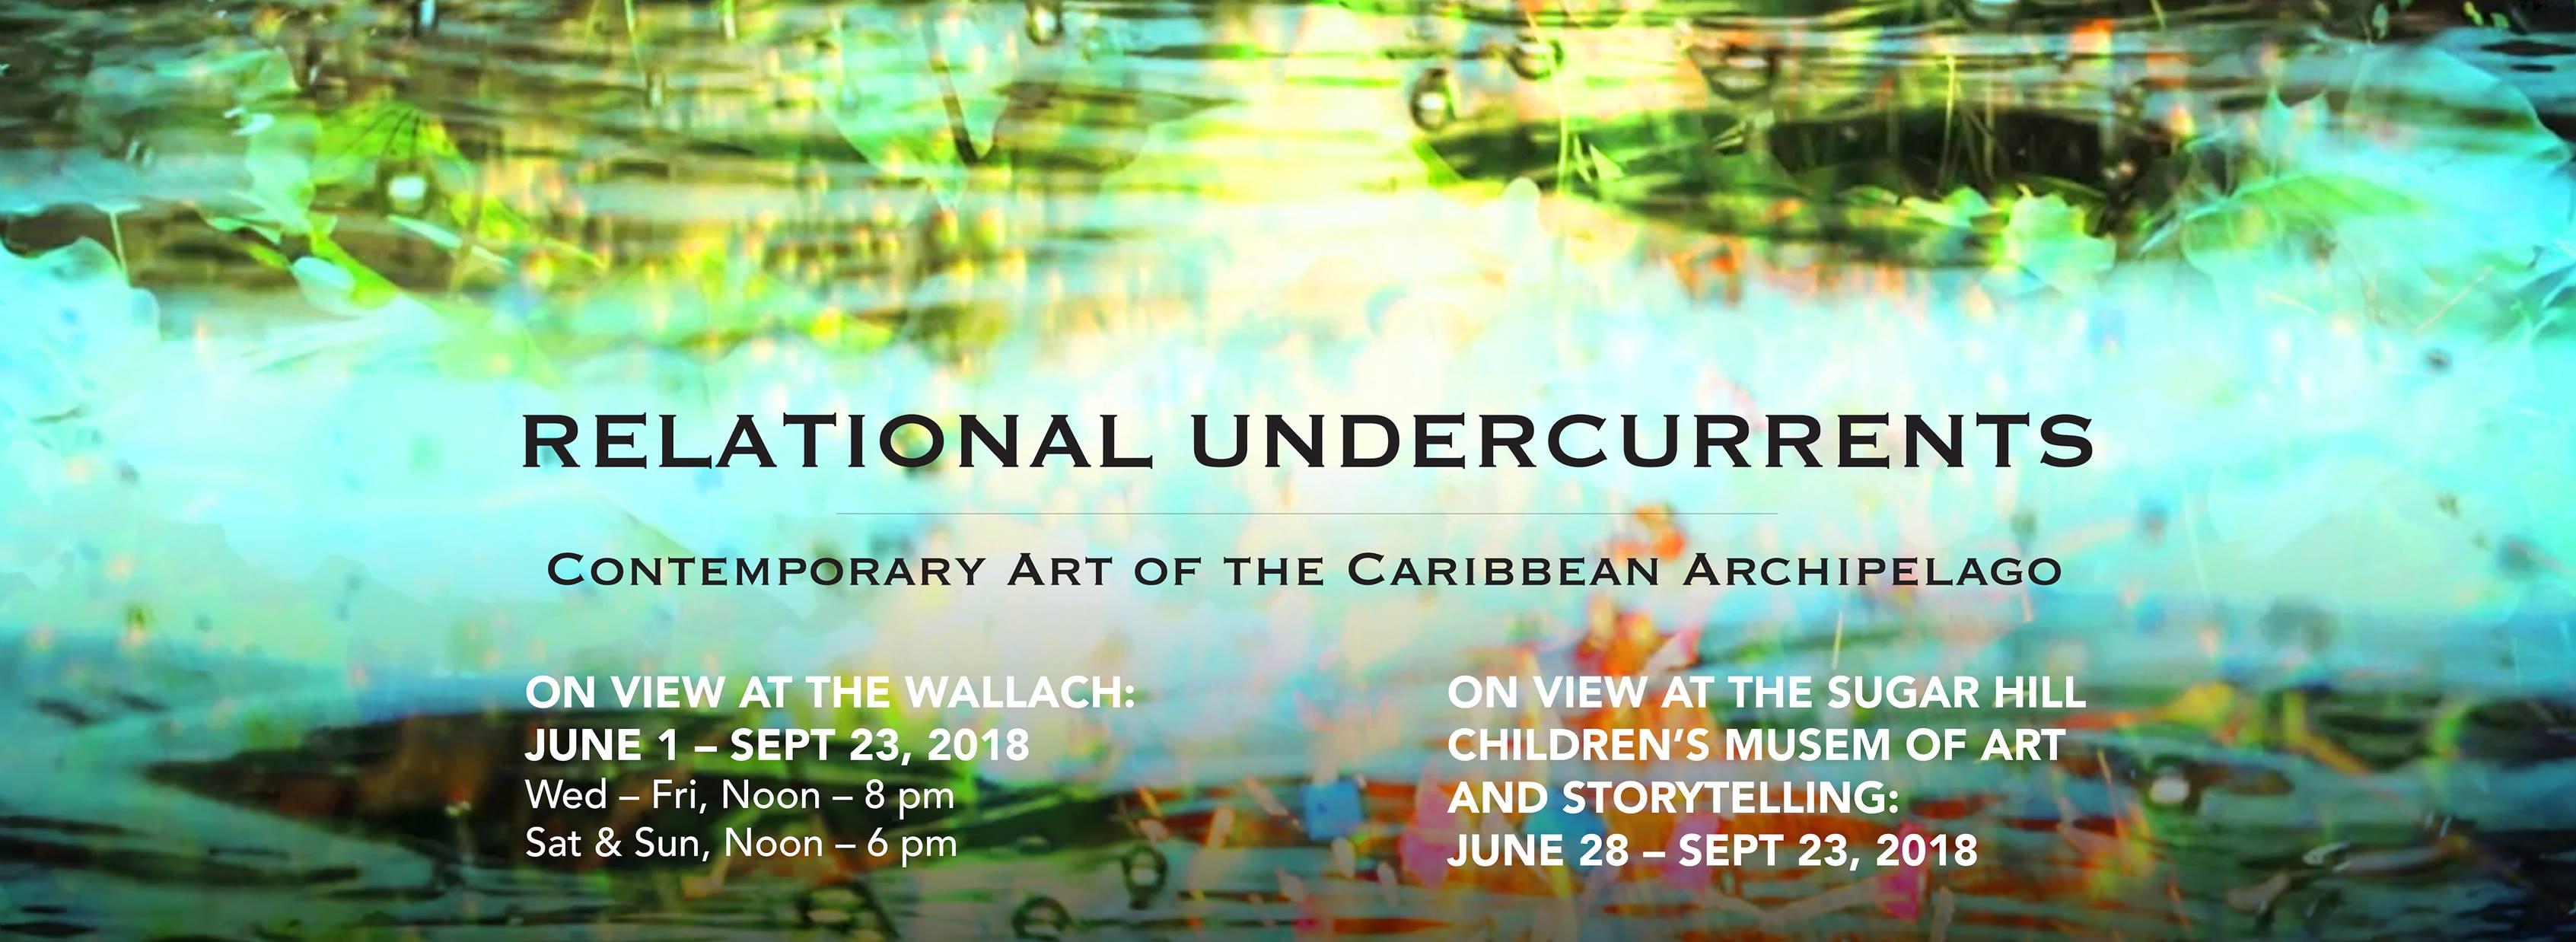 Relational Undercurrents: Contemporary Art of the Caribbean Archipelago,